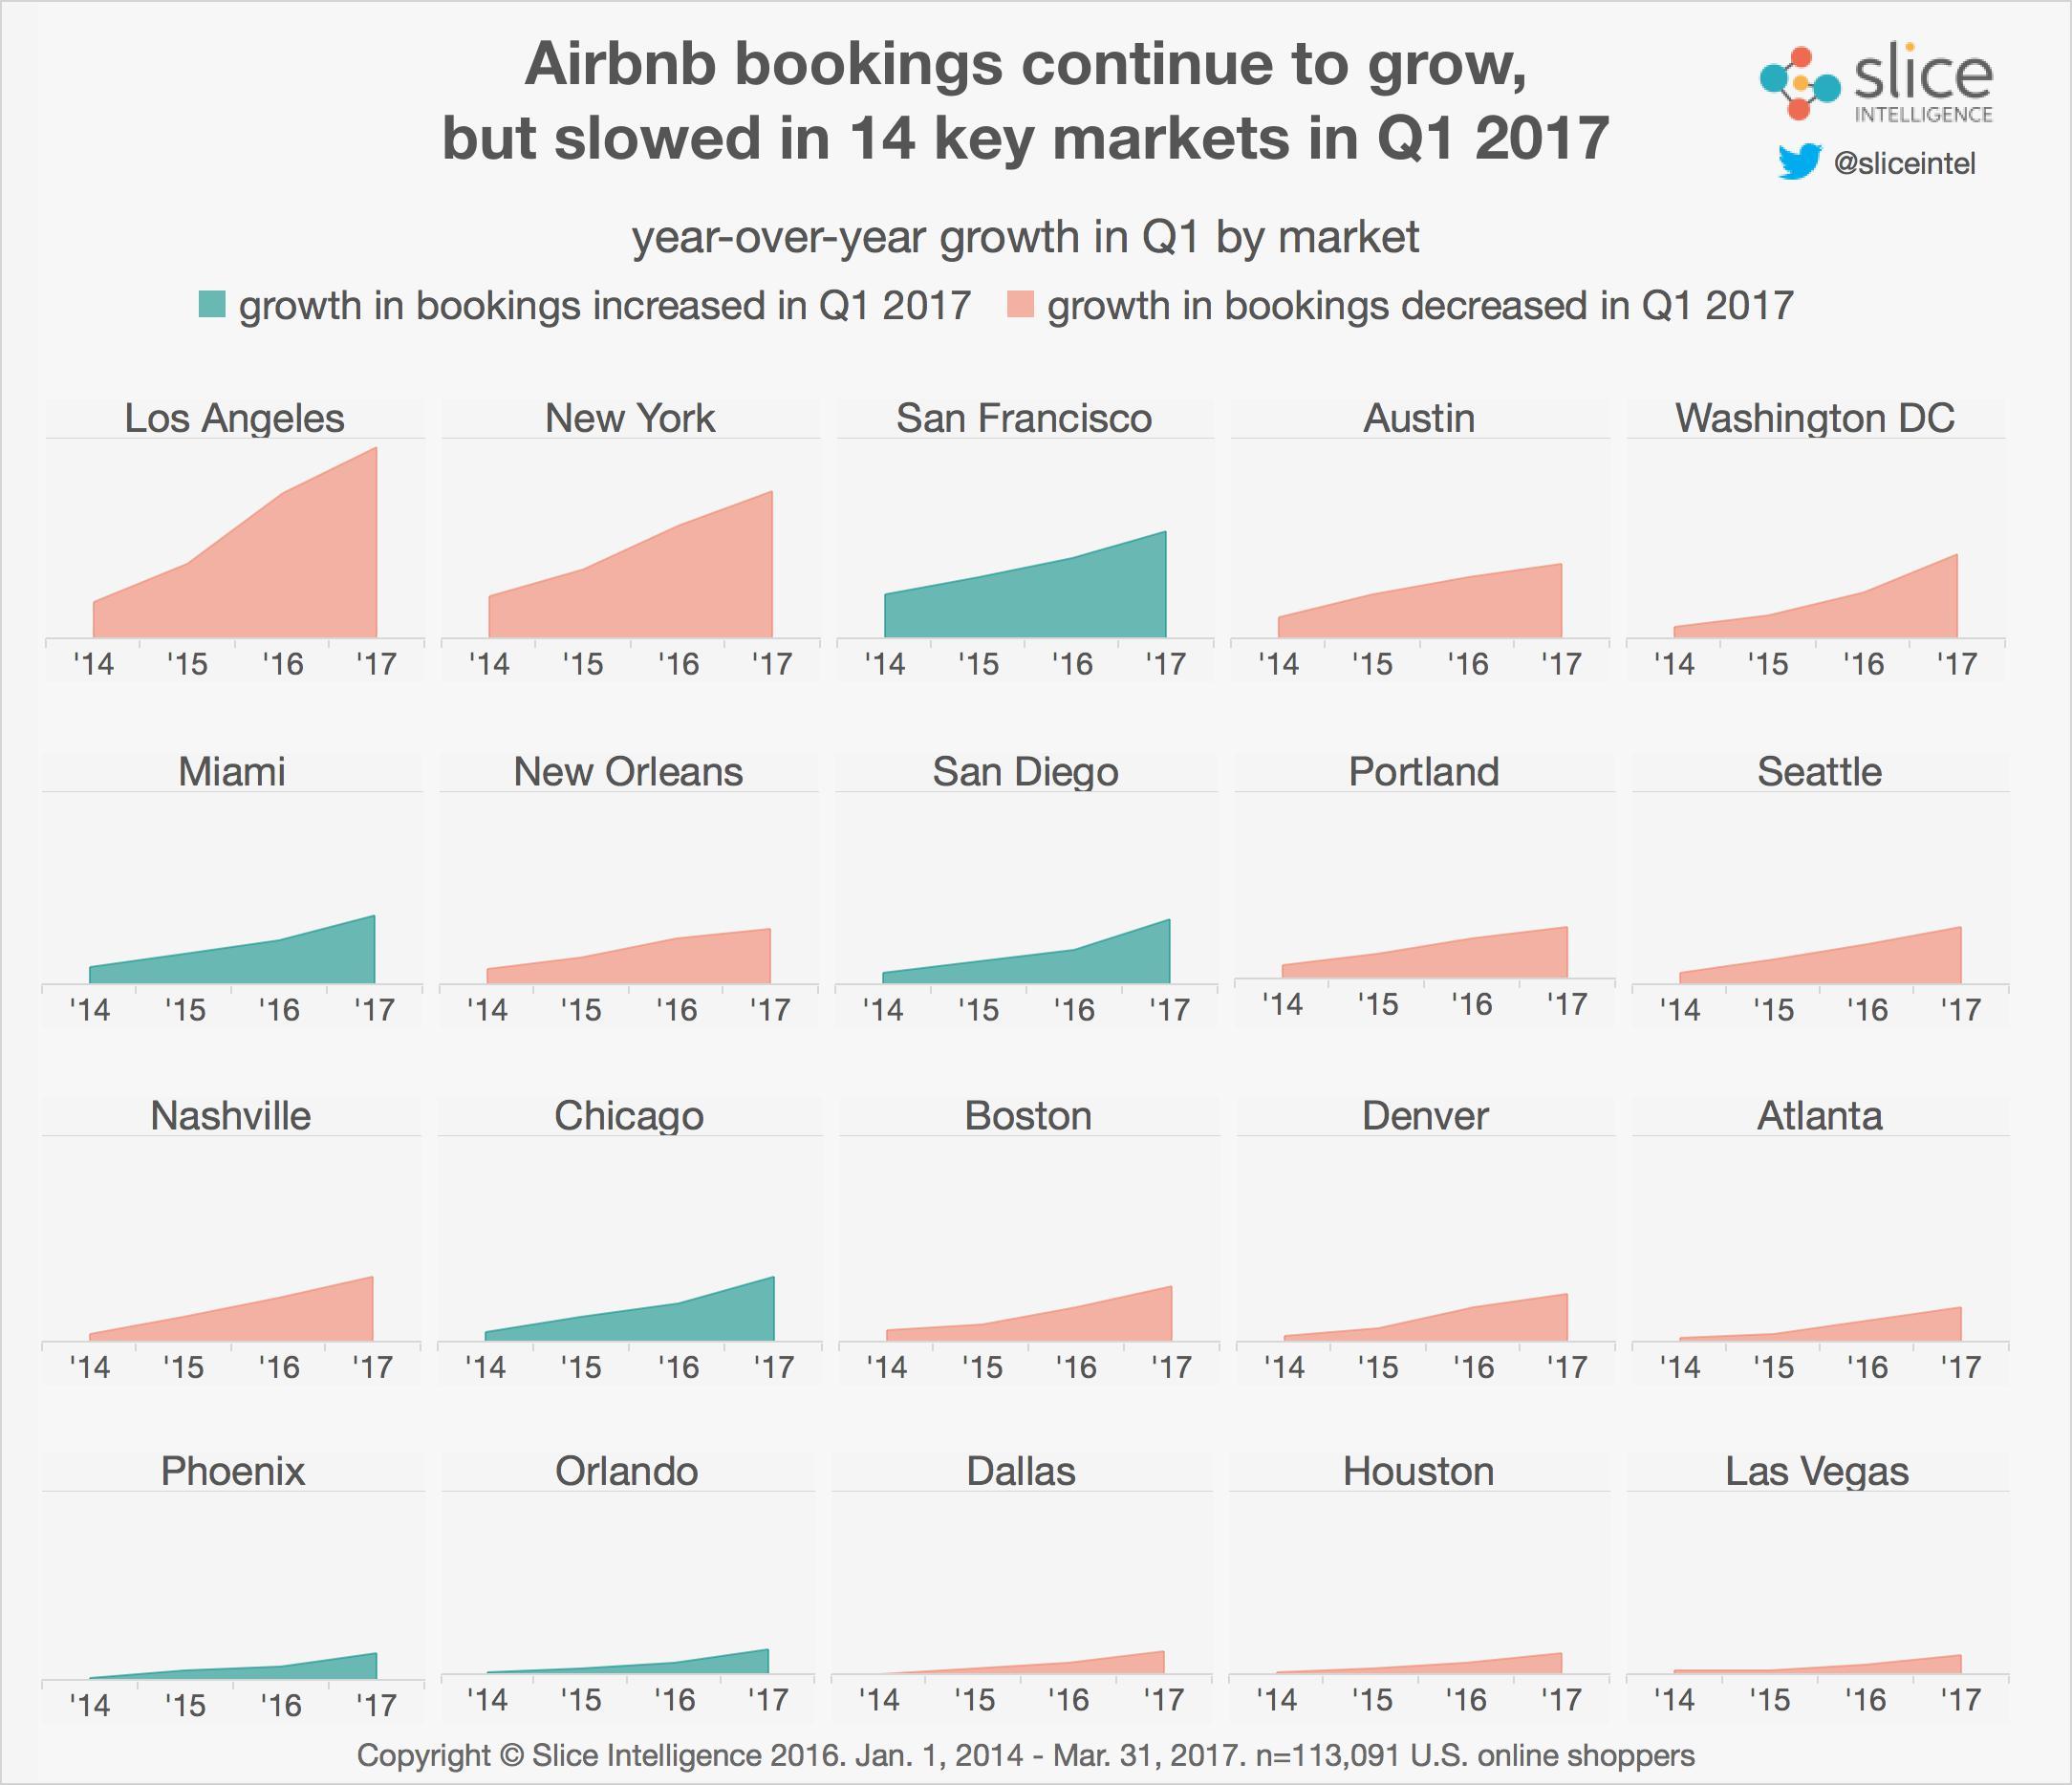 airbnb annual report 2017 pdf